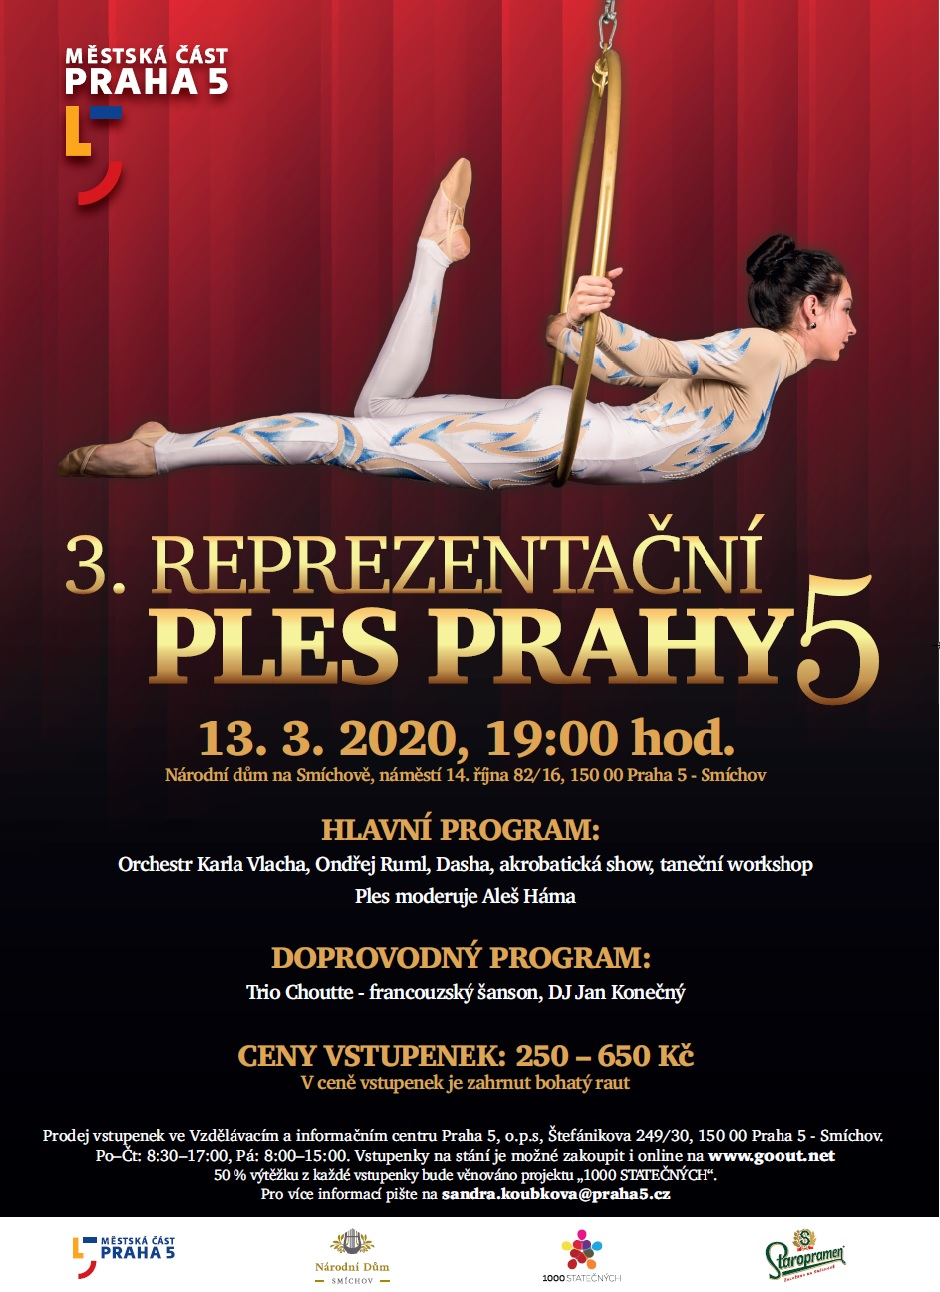 3-reprezentacni-ples-prahy-5-podpori-projekt-1000-statecnych